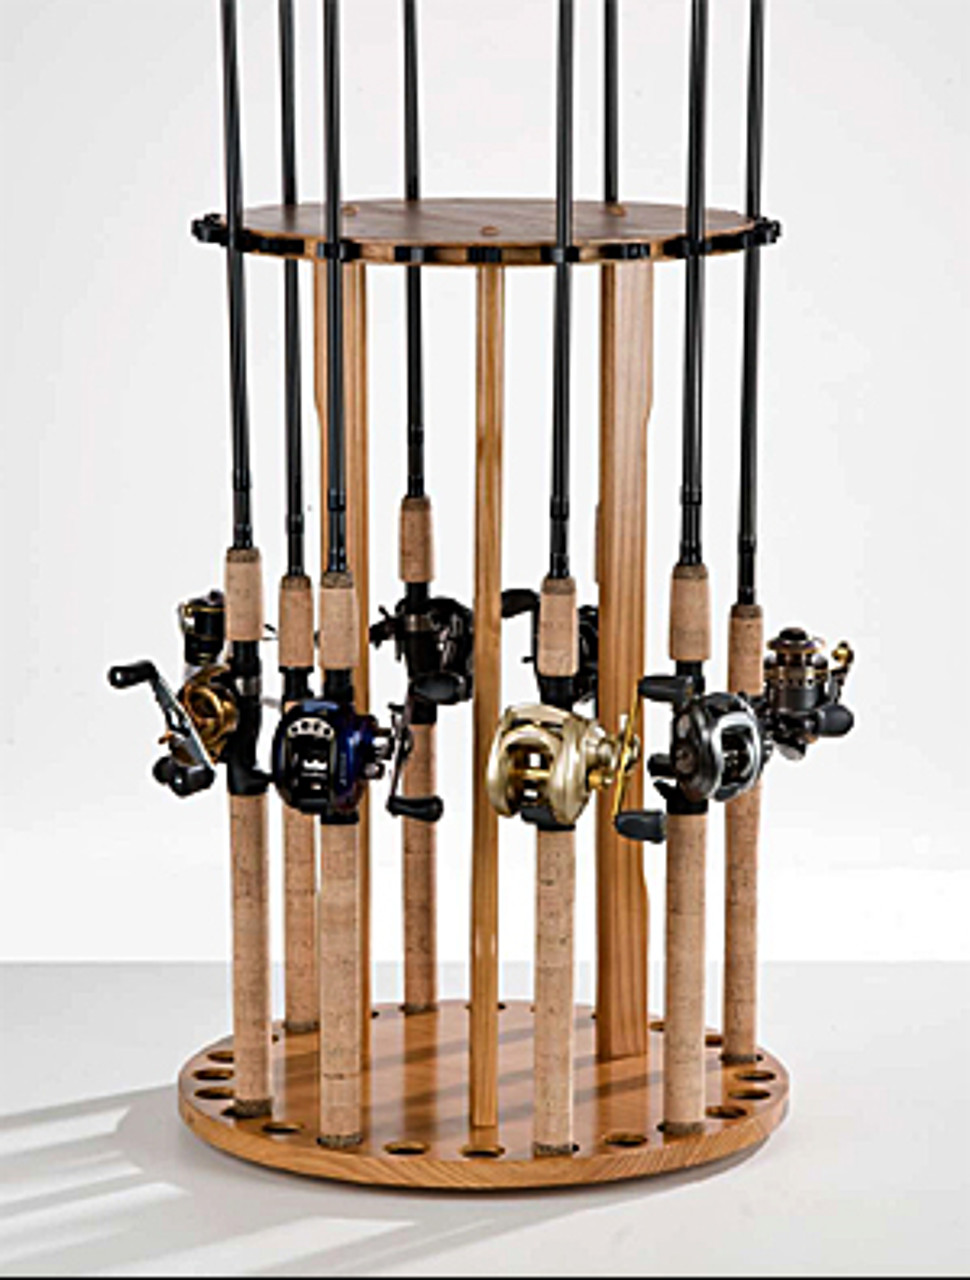 24 fishing rod rack